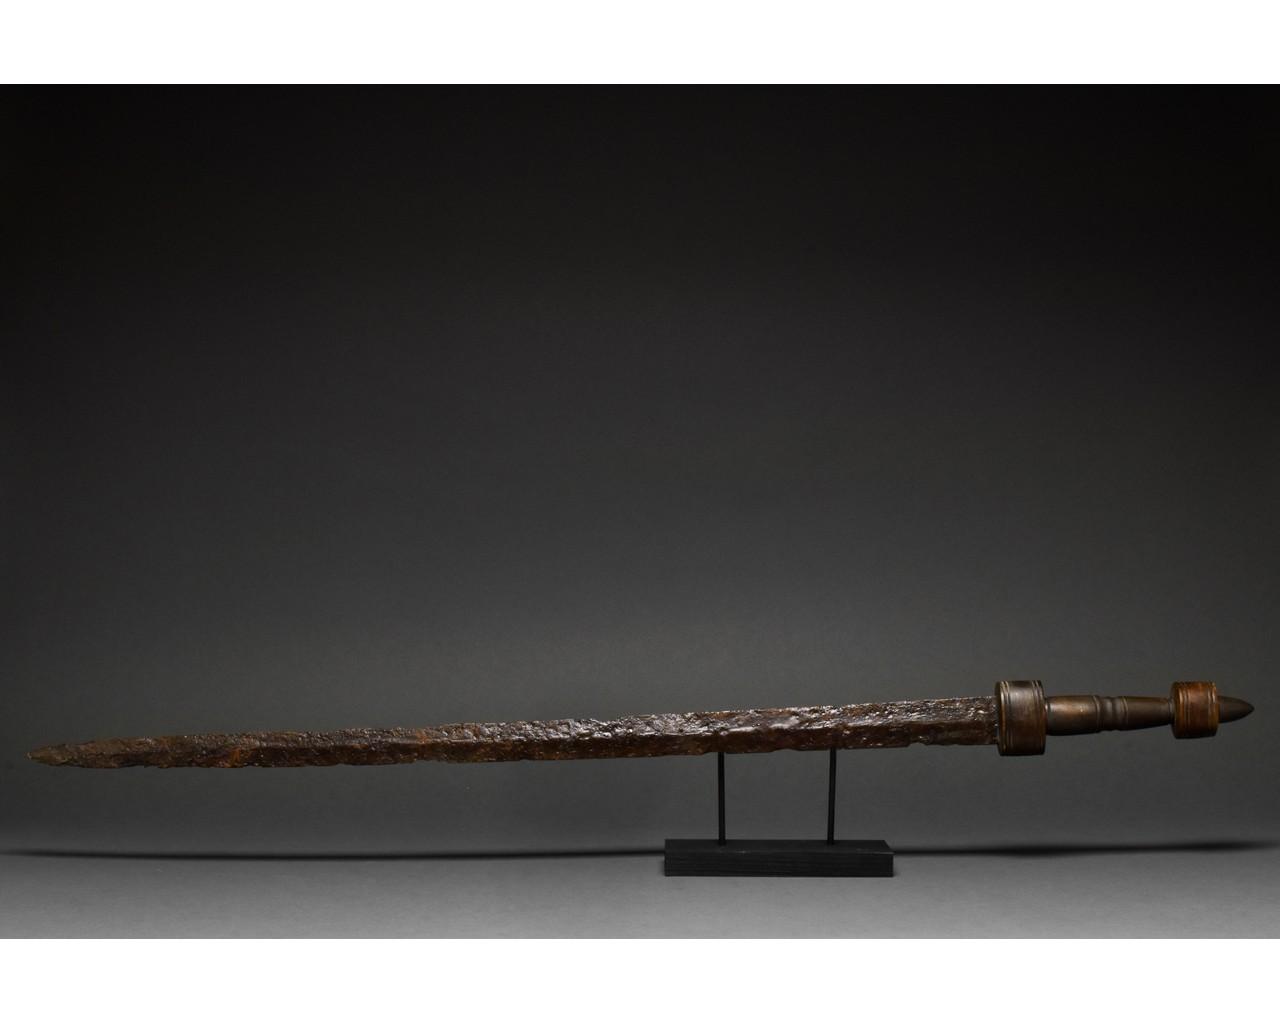 ROMAN IRON SPATHA SWORD - Image 3 of 8